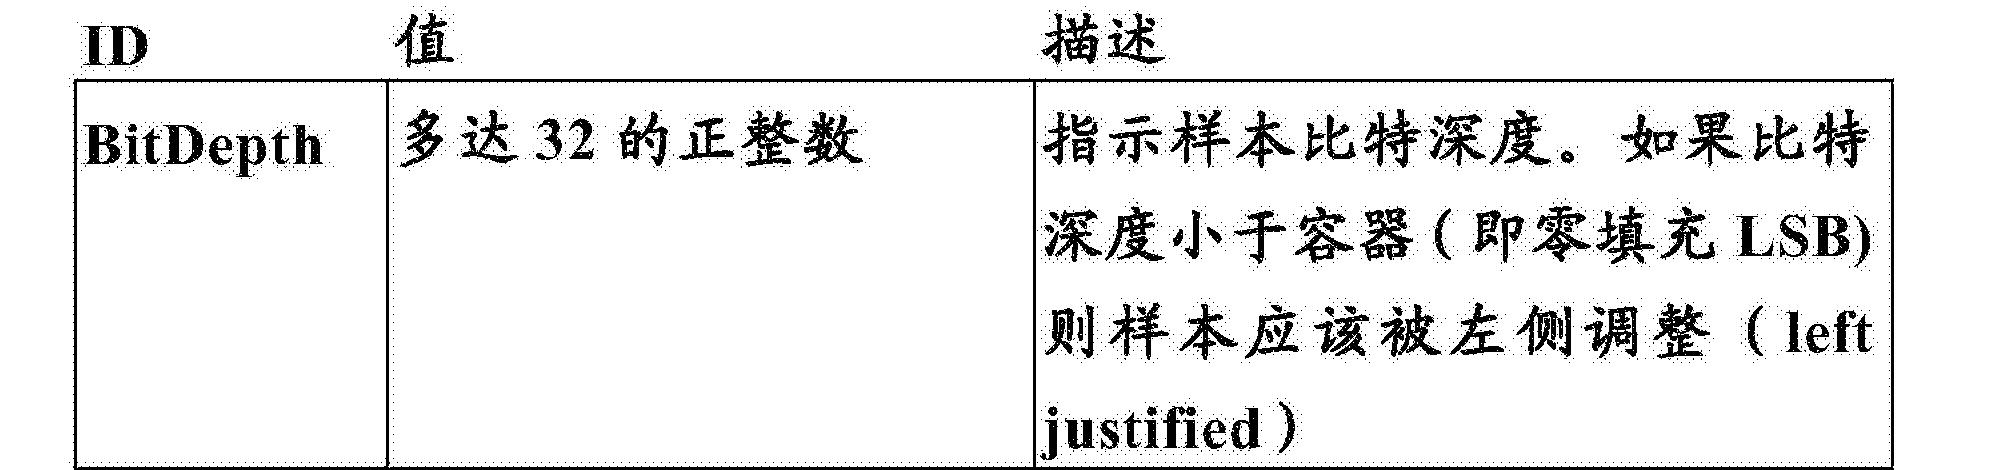 Figure CN105792086AD00261